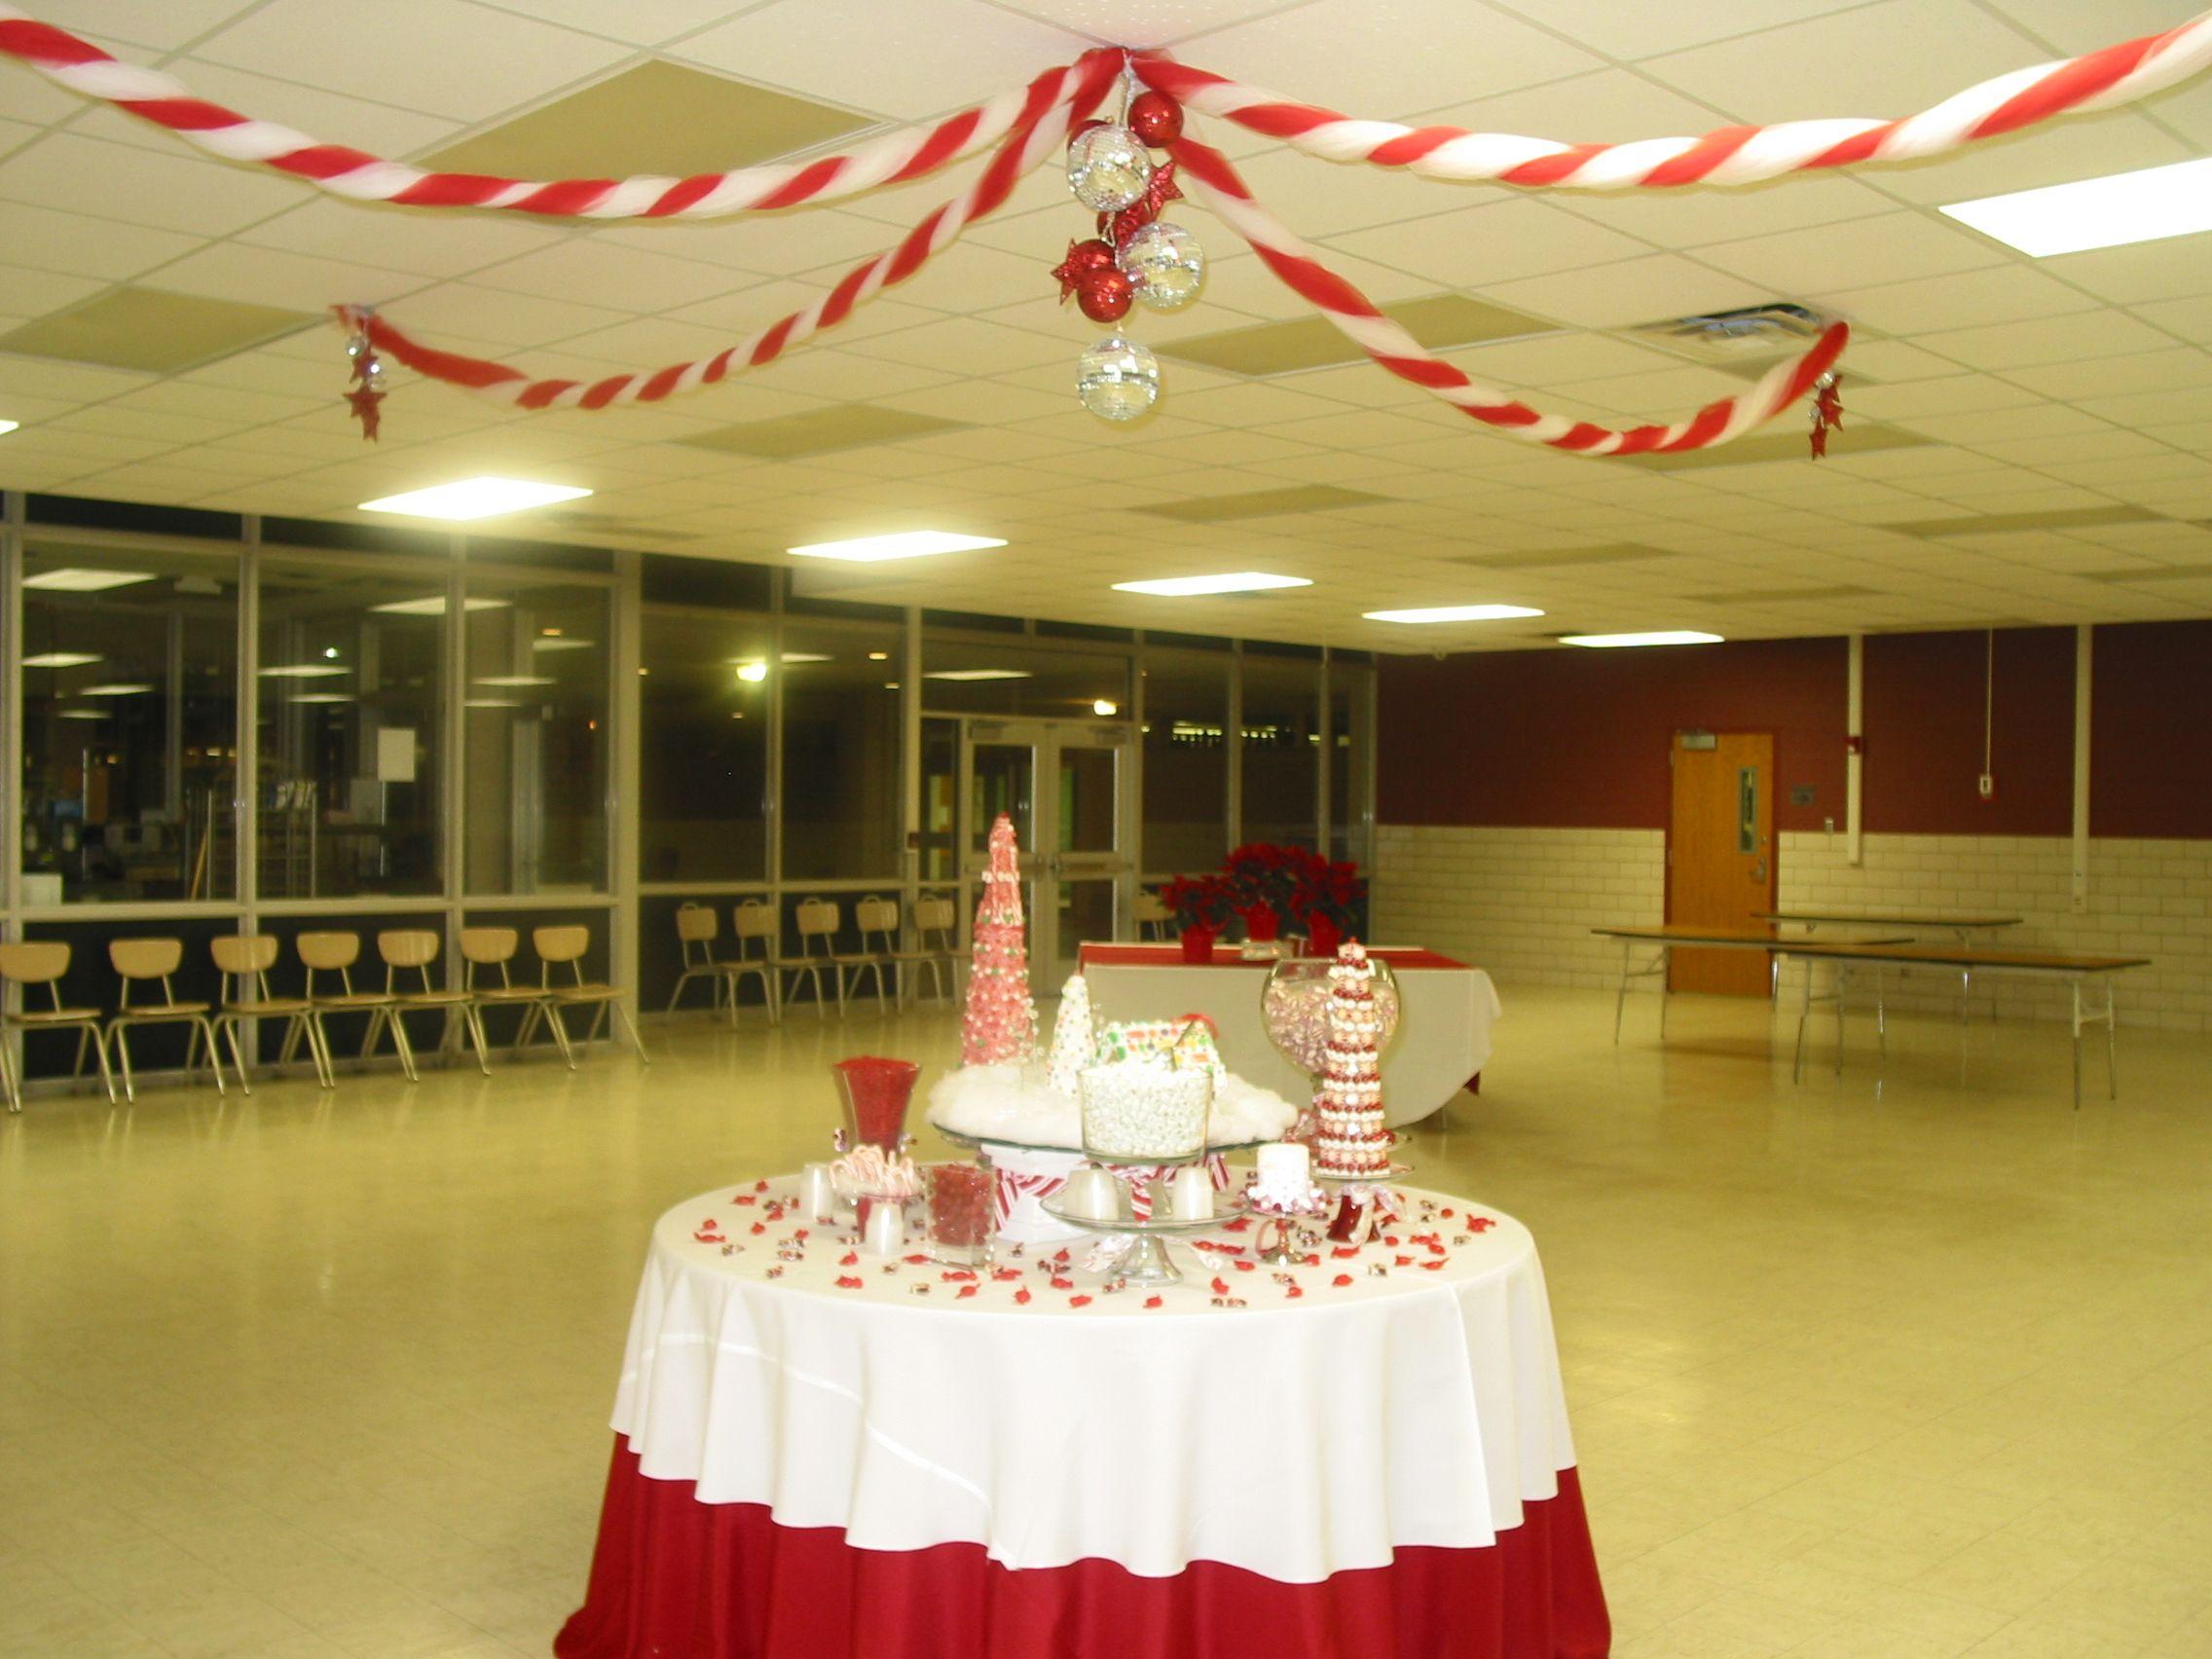 A cool school Christmas cafeteria! | School cafeteria ...